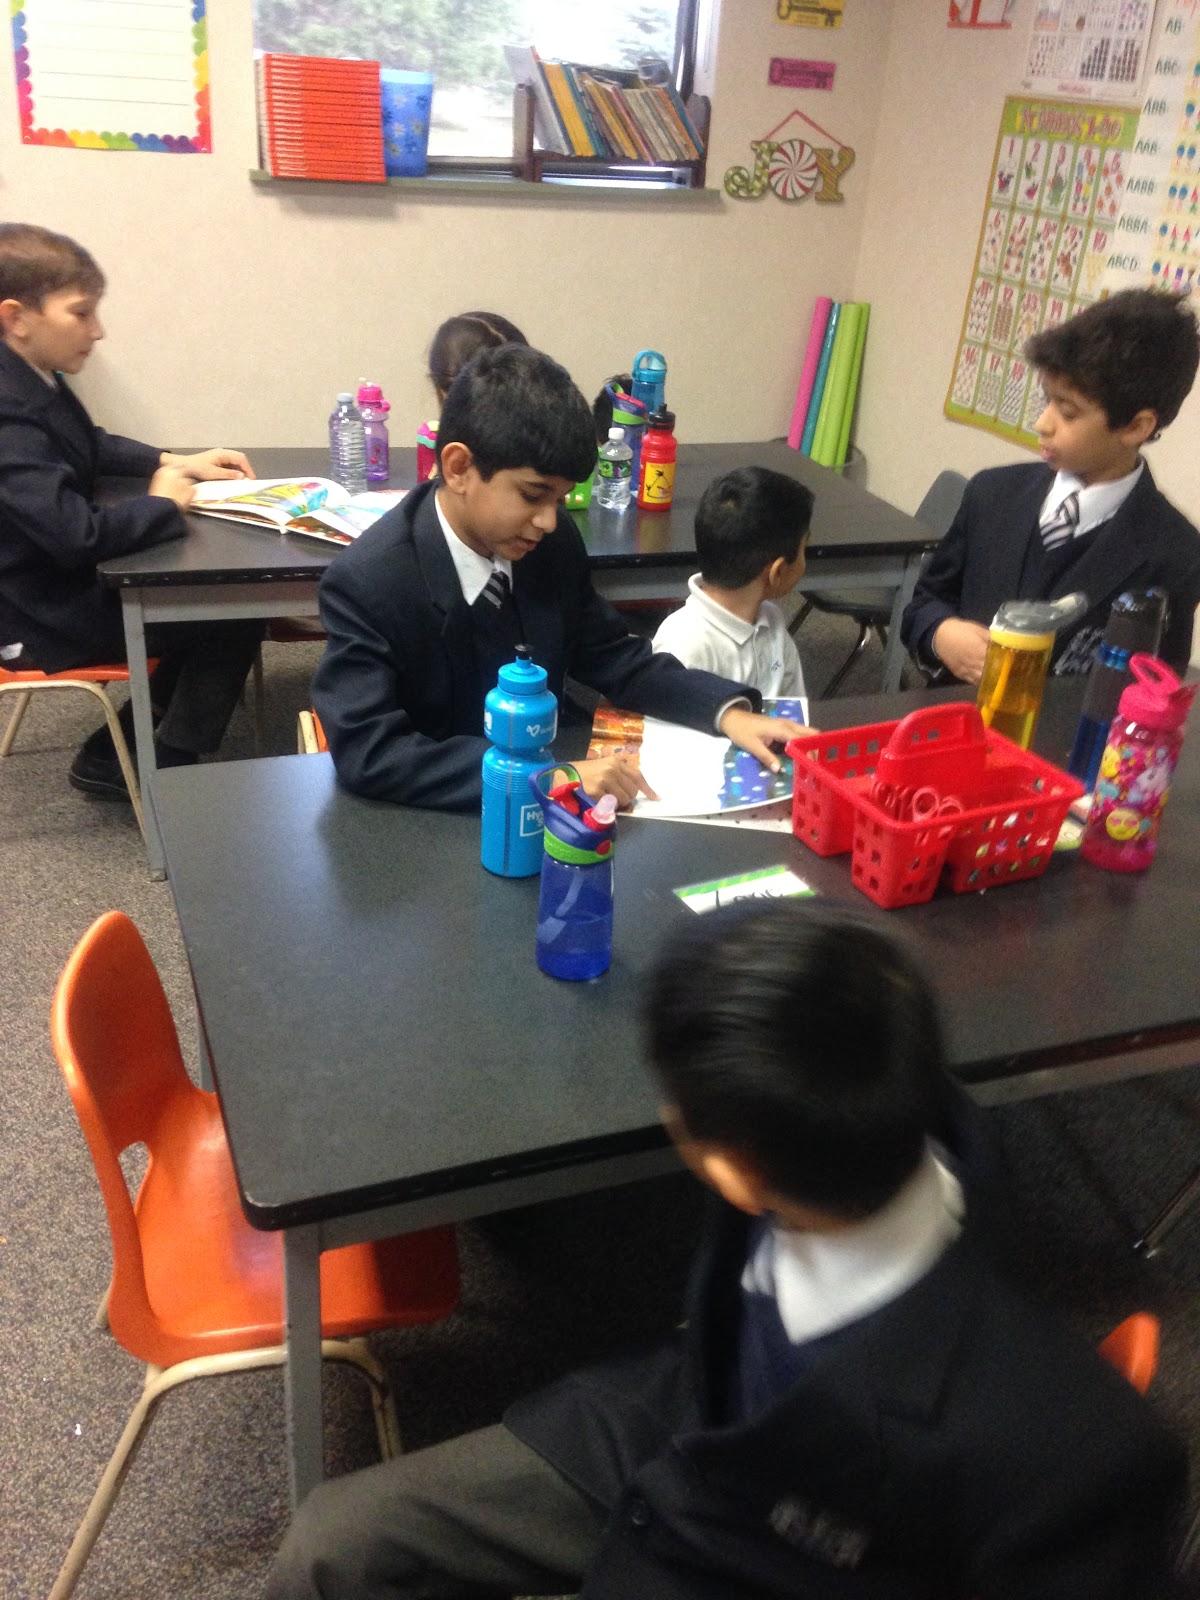 Msan S Classroom Top Tuesday